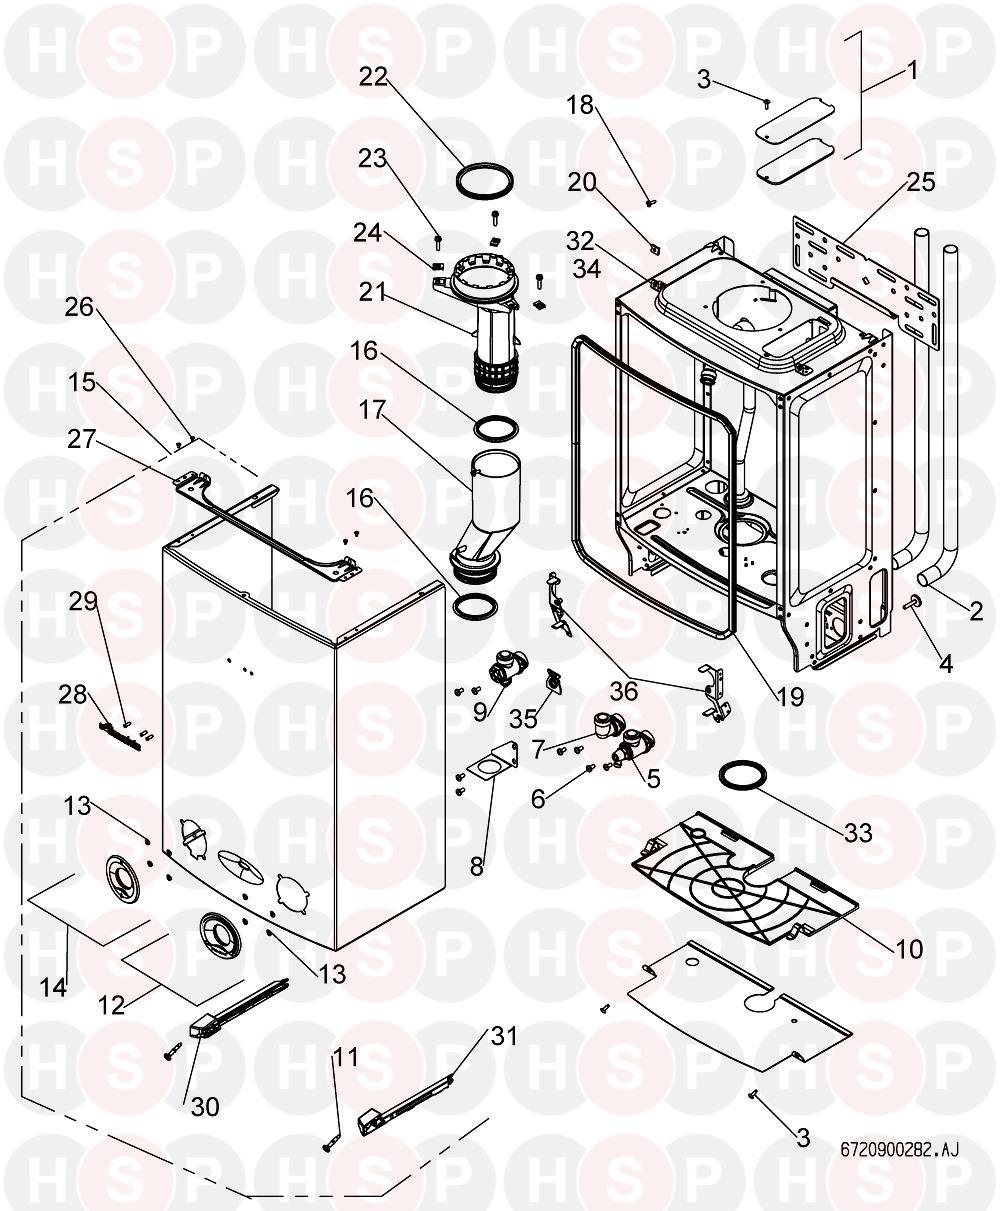 worcester greenstar 24 ri he  casing  diagram